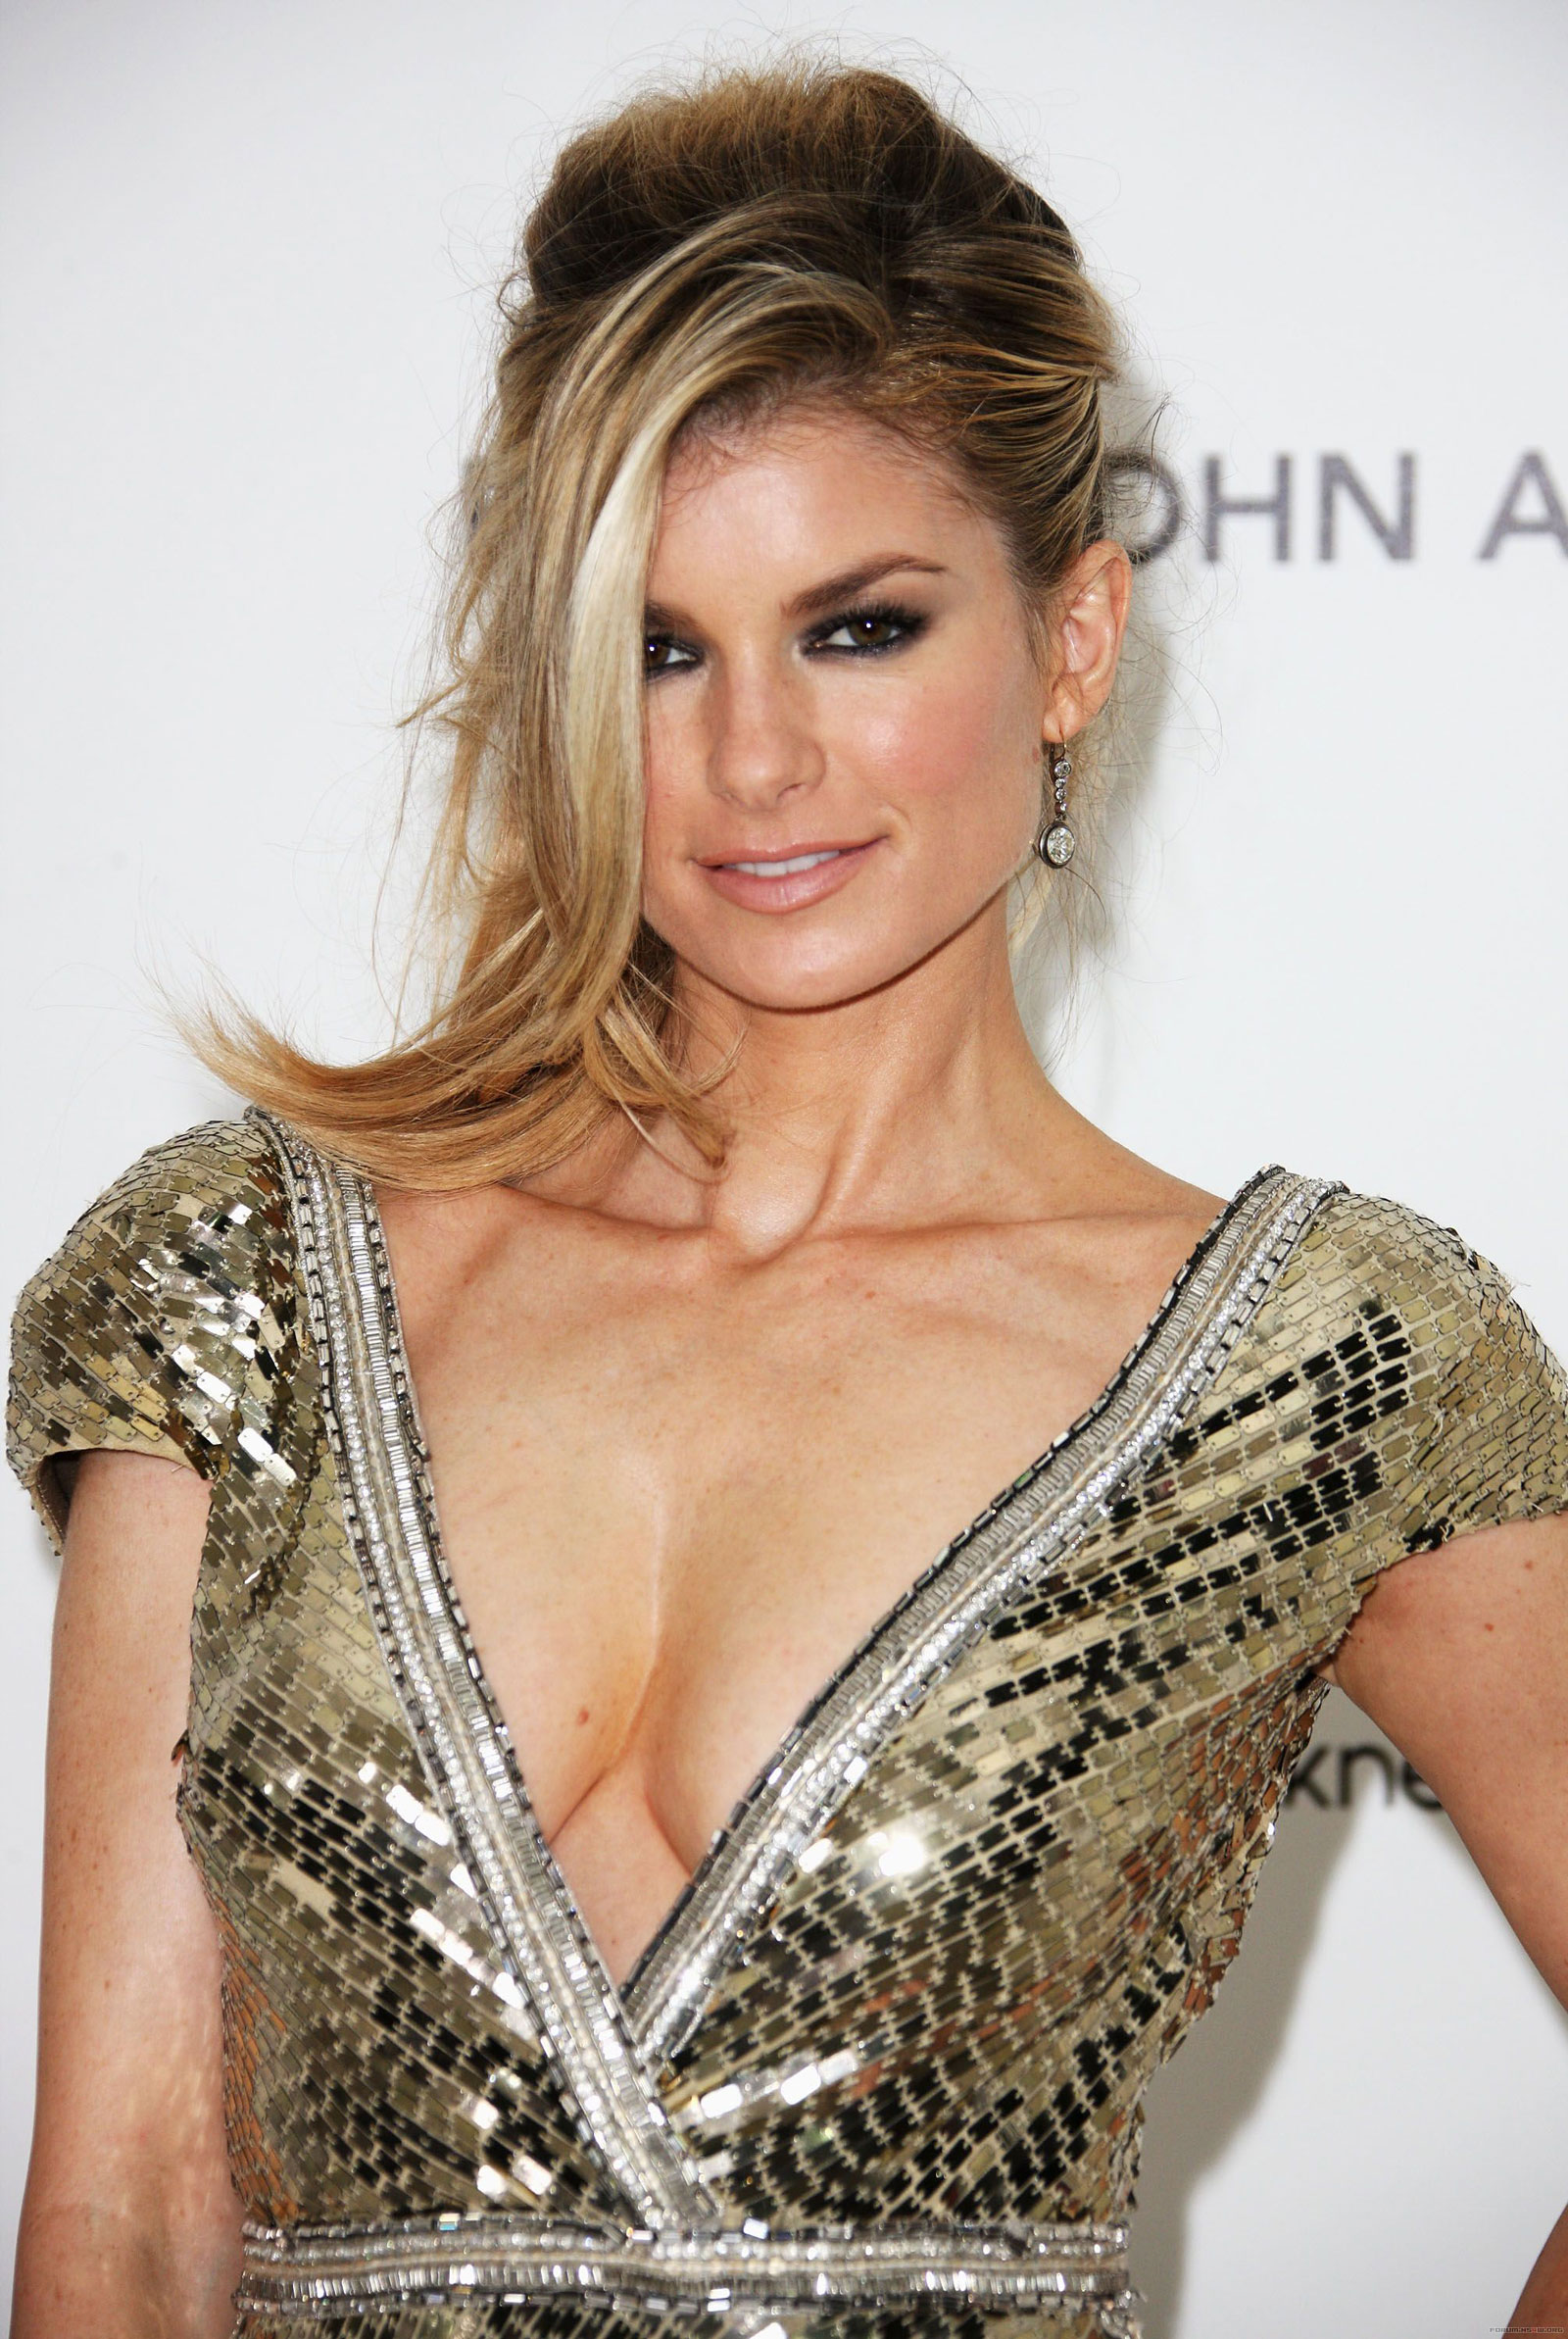 tight #dress #satin | Sexy Satin! | Pinterest | Satin, Marisa ...